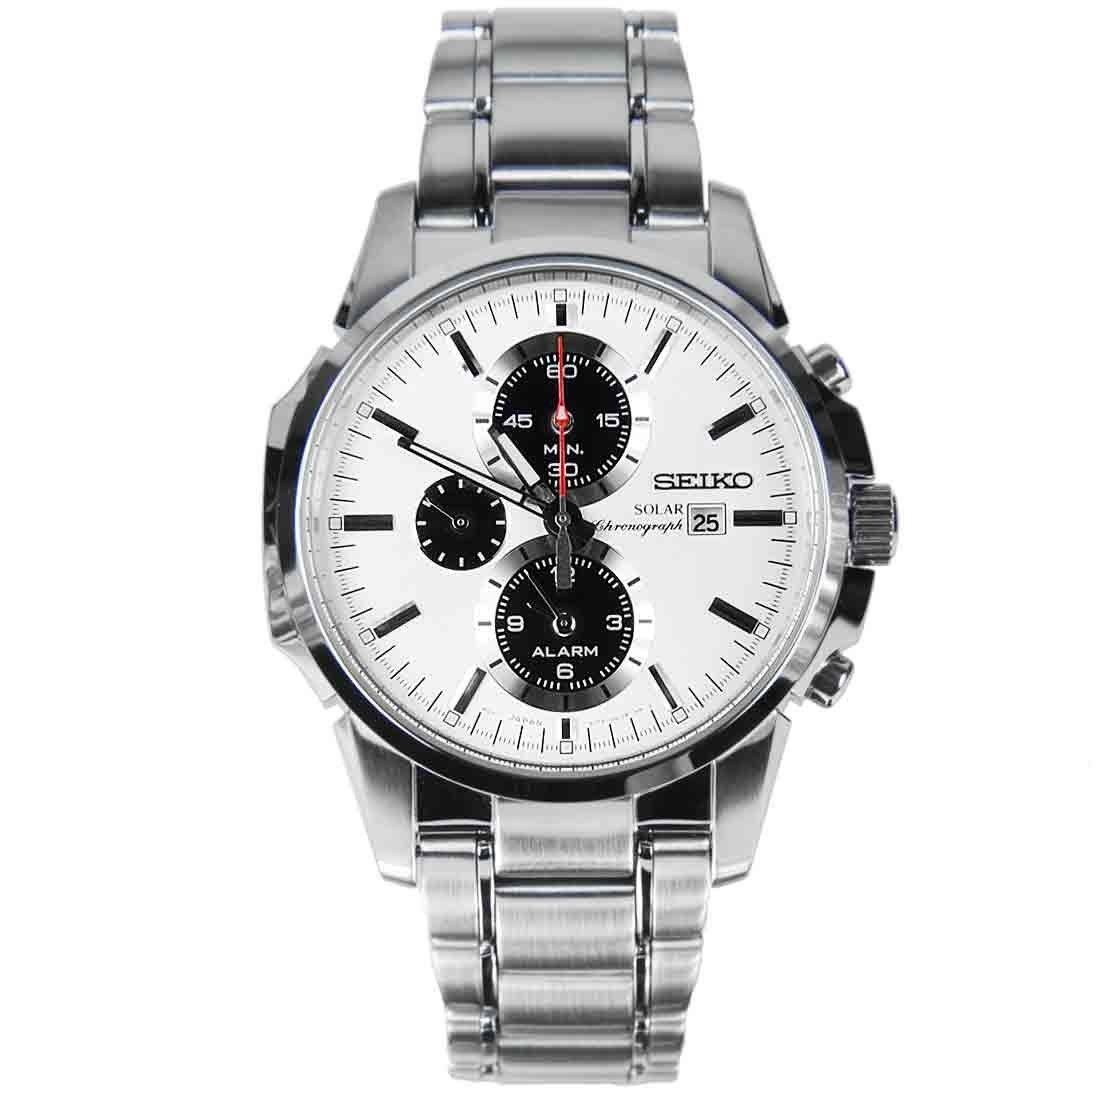 seiko solar chronograph mens watch ssc081p1 ssc083p1 ssc085p1 seiko solar chronograph mens watch ssc081p1 ssc083p1 ssc085p1